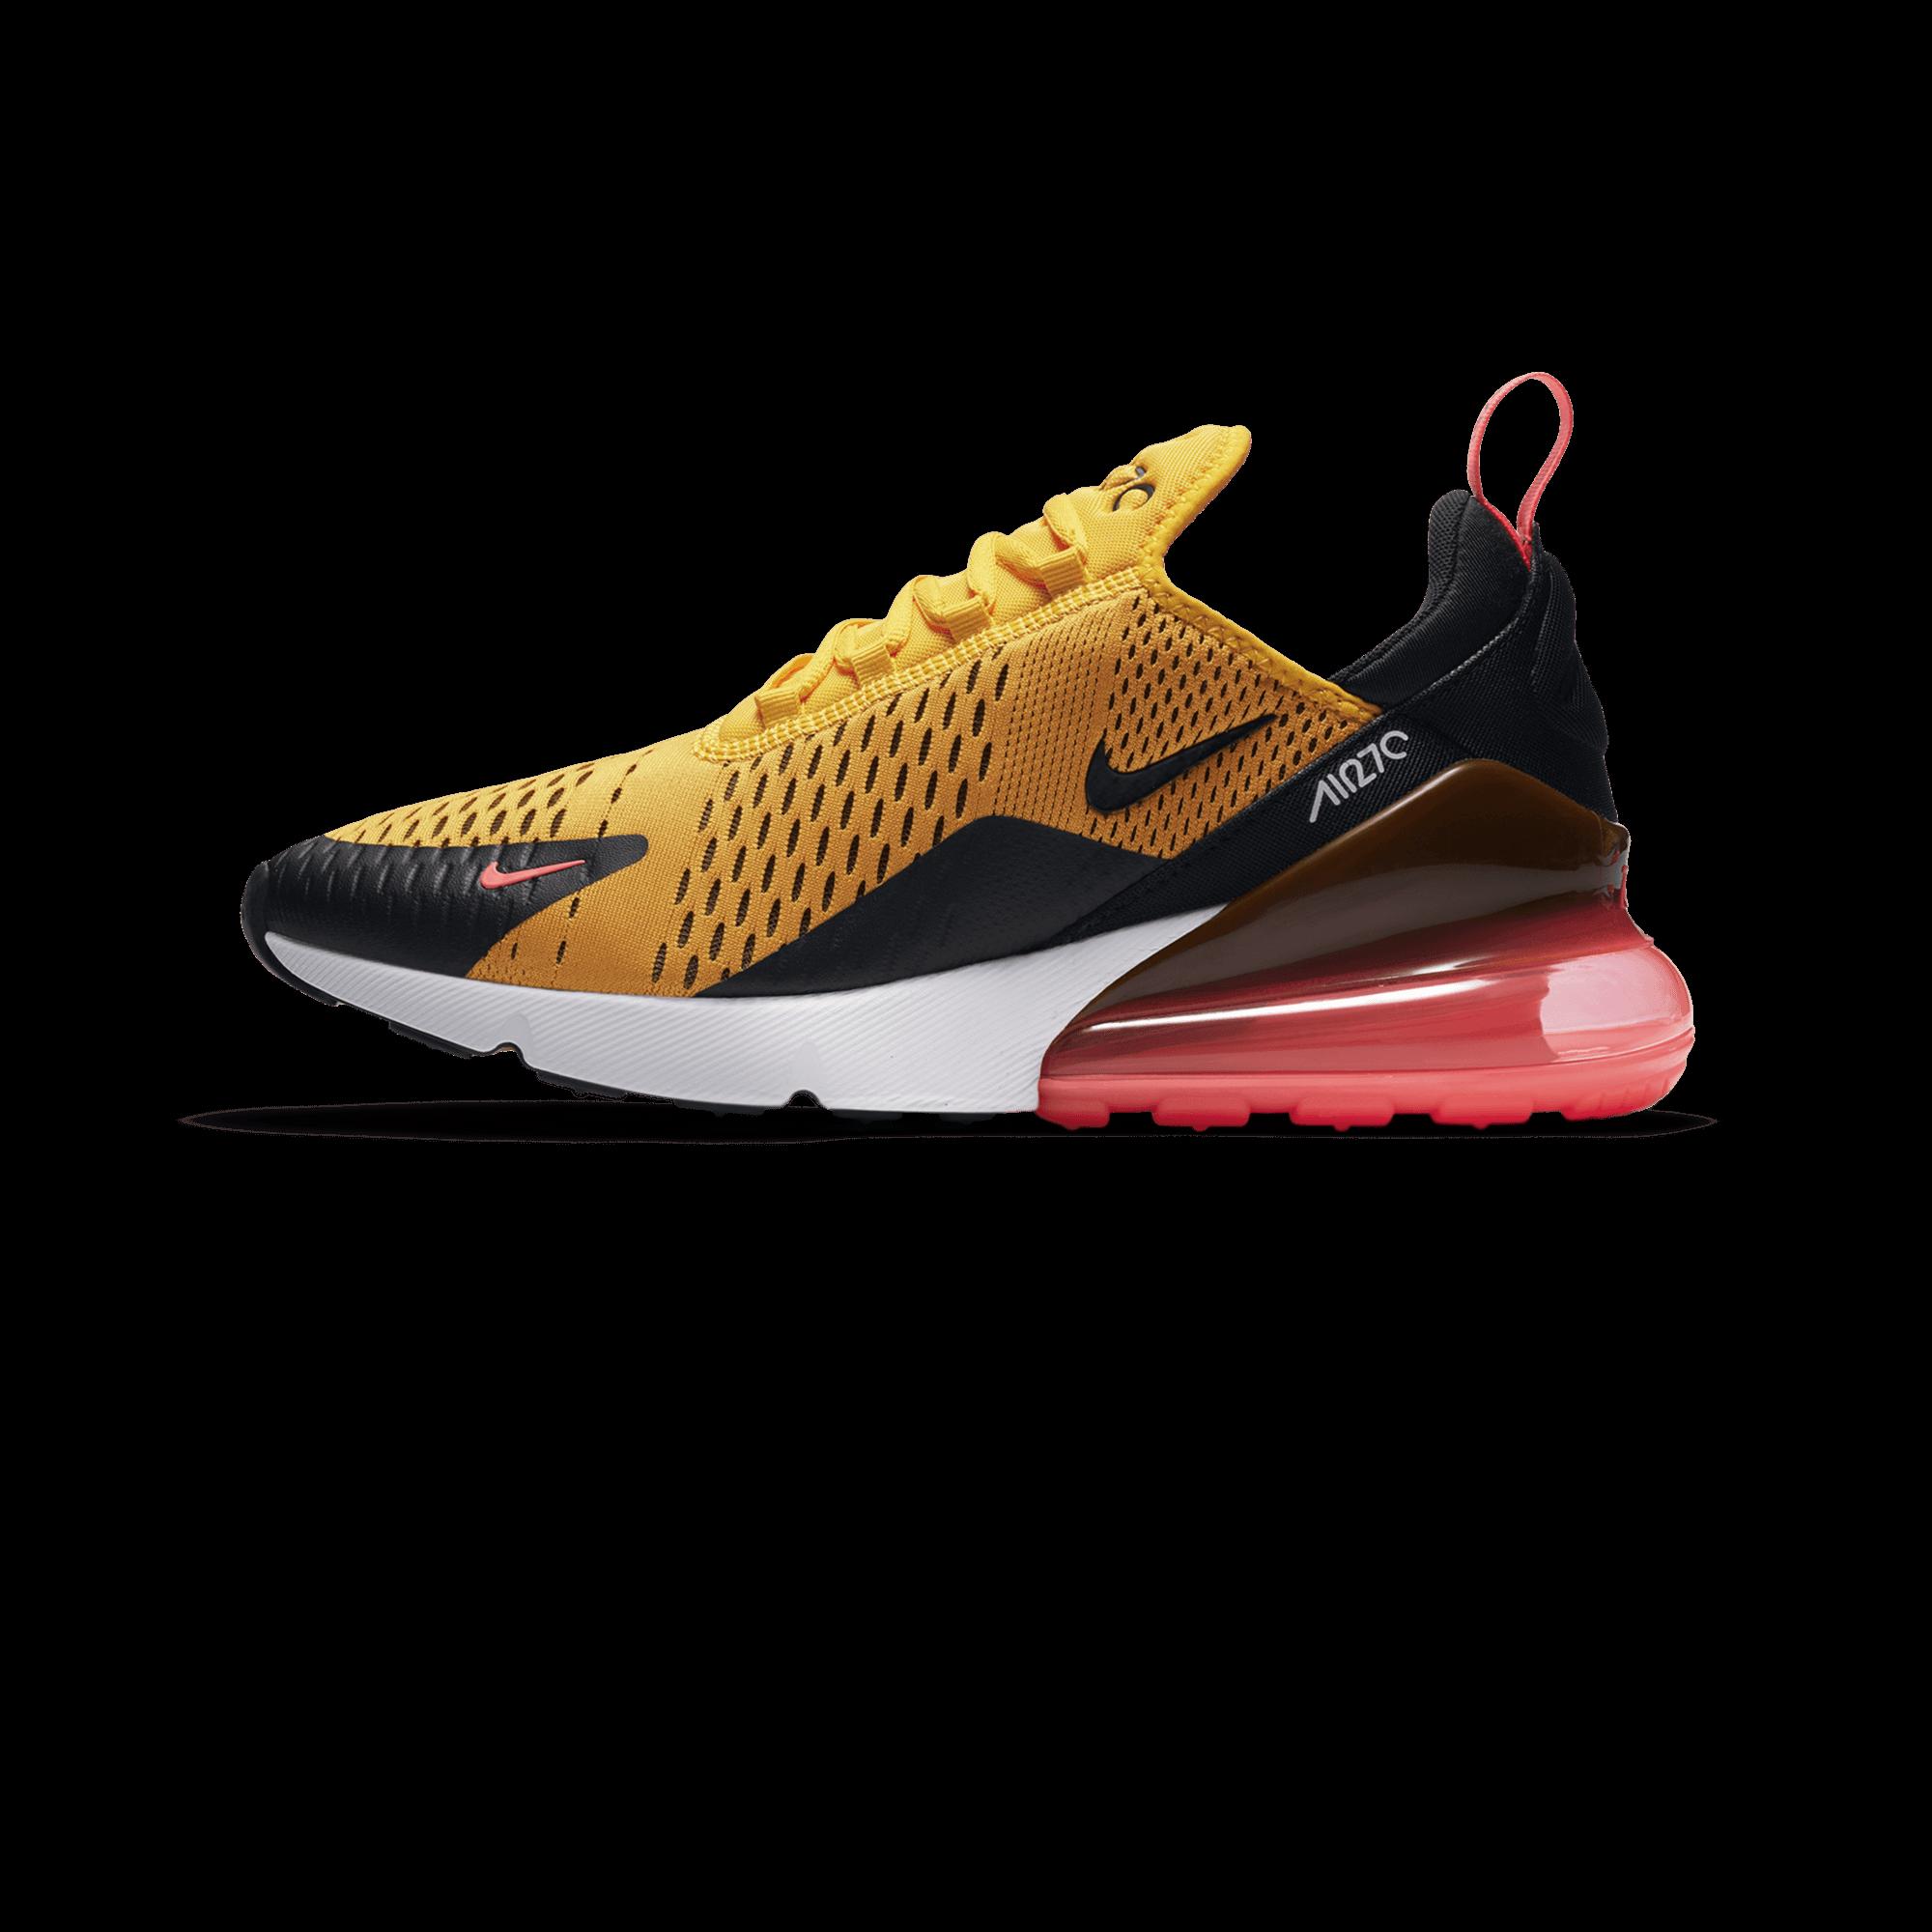 fb2cdd74b Nike Air Max 270 black / university gold / hot punch - Men ...